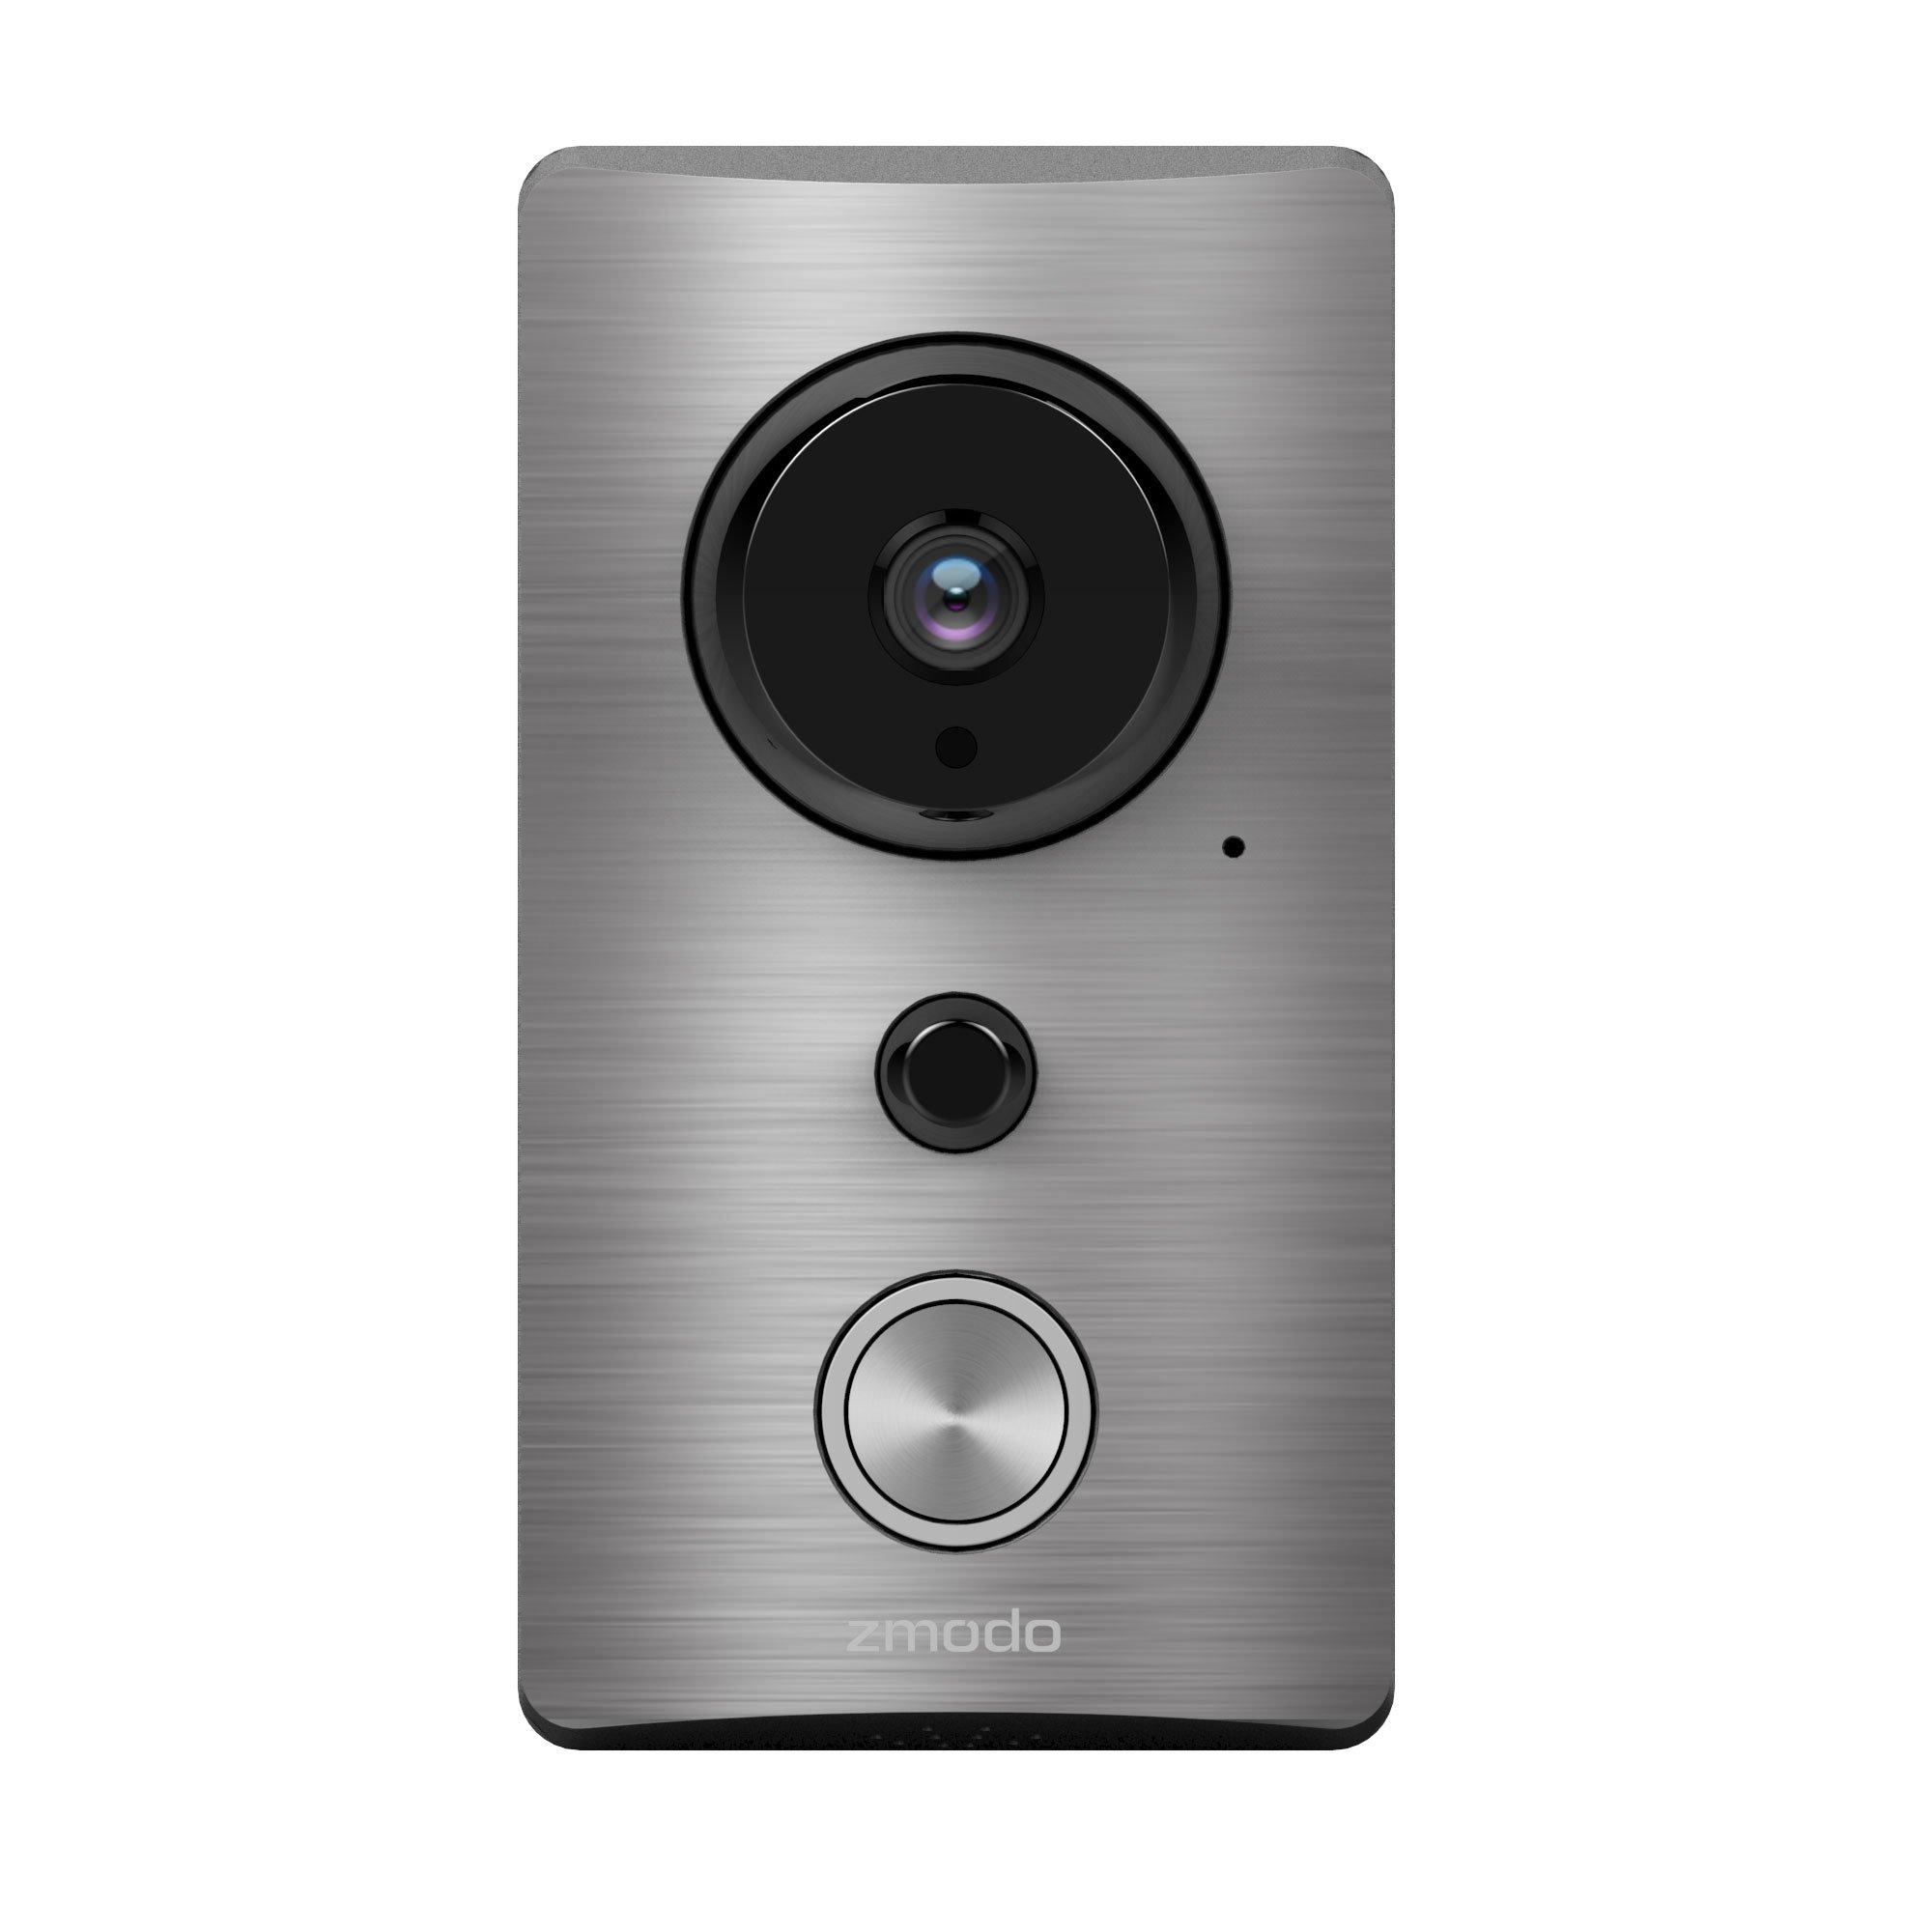 Zmodo Greet - Smart WiFi Video Doorbell by Zmodo